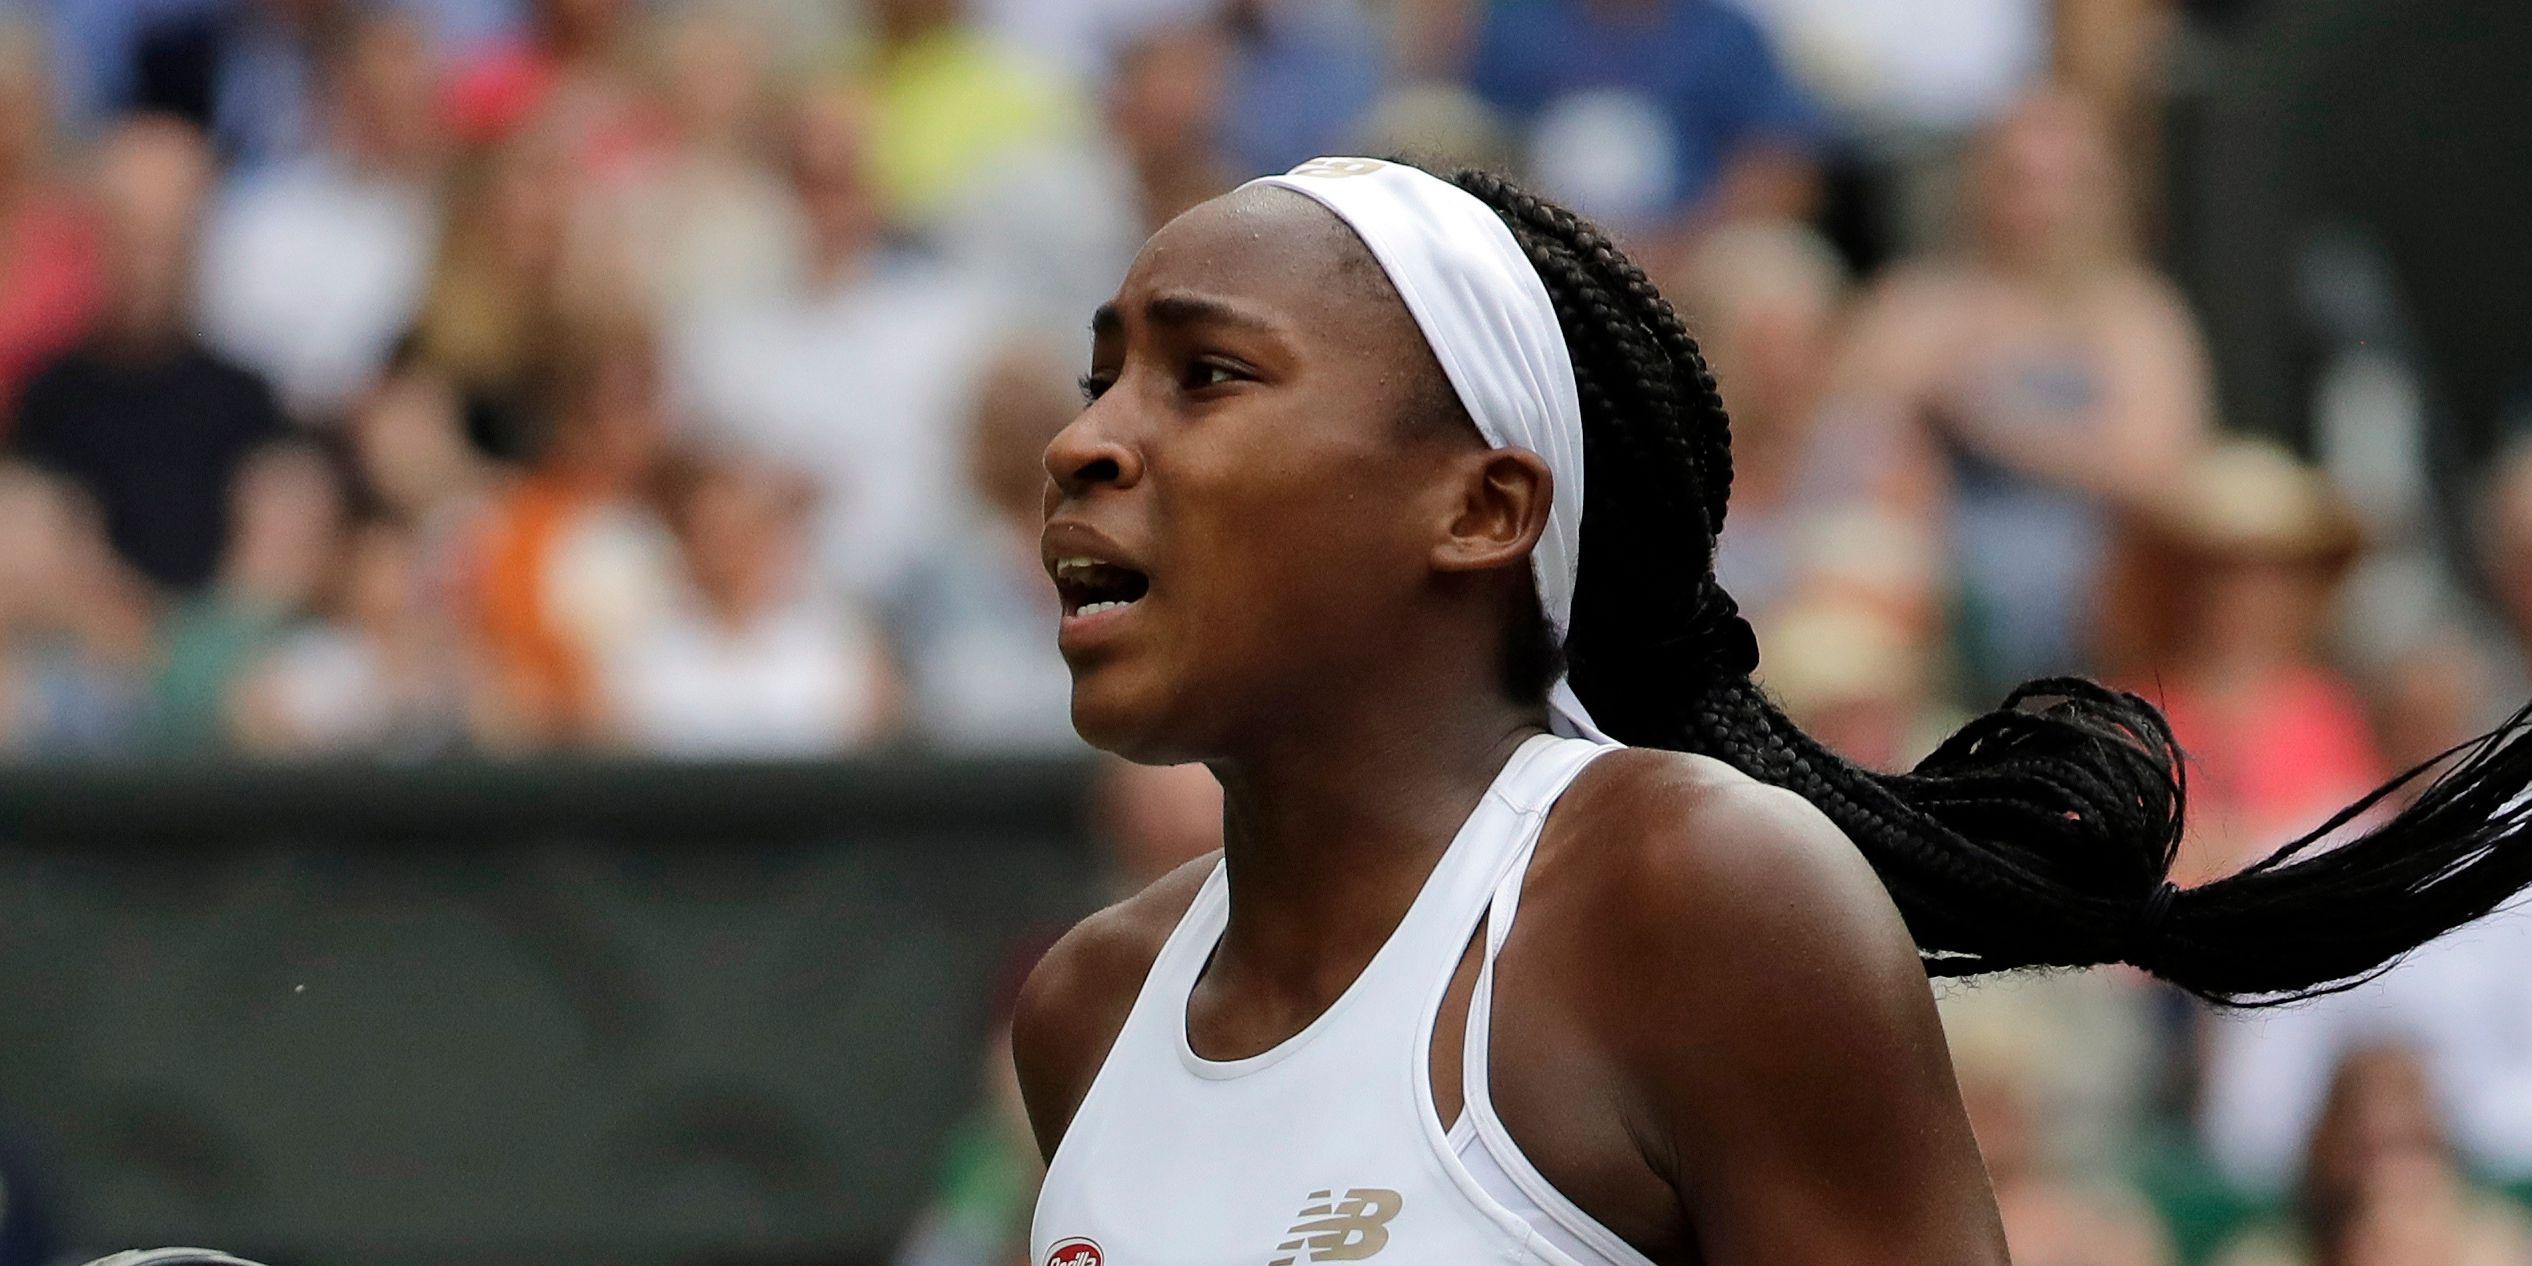 Coco Gauff loses at Wimbledon, while Williams wins again